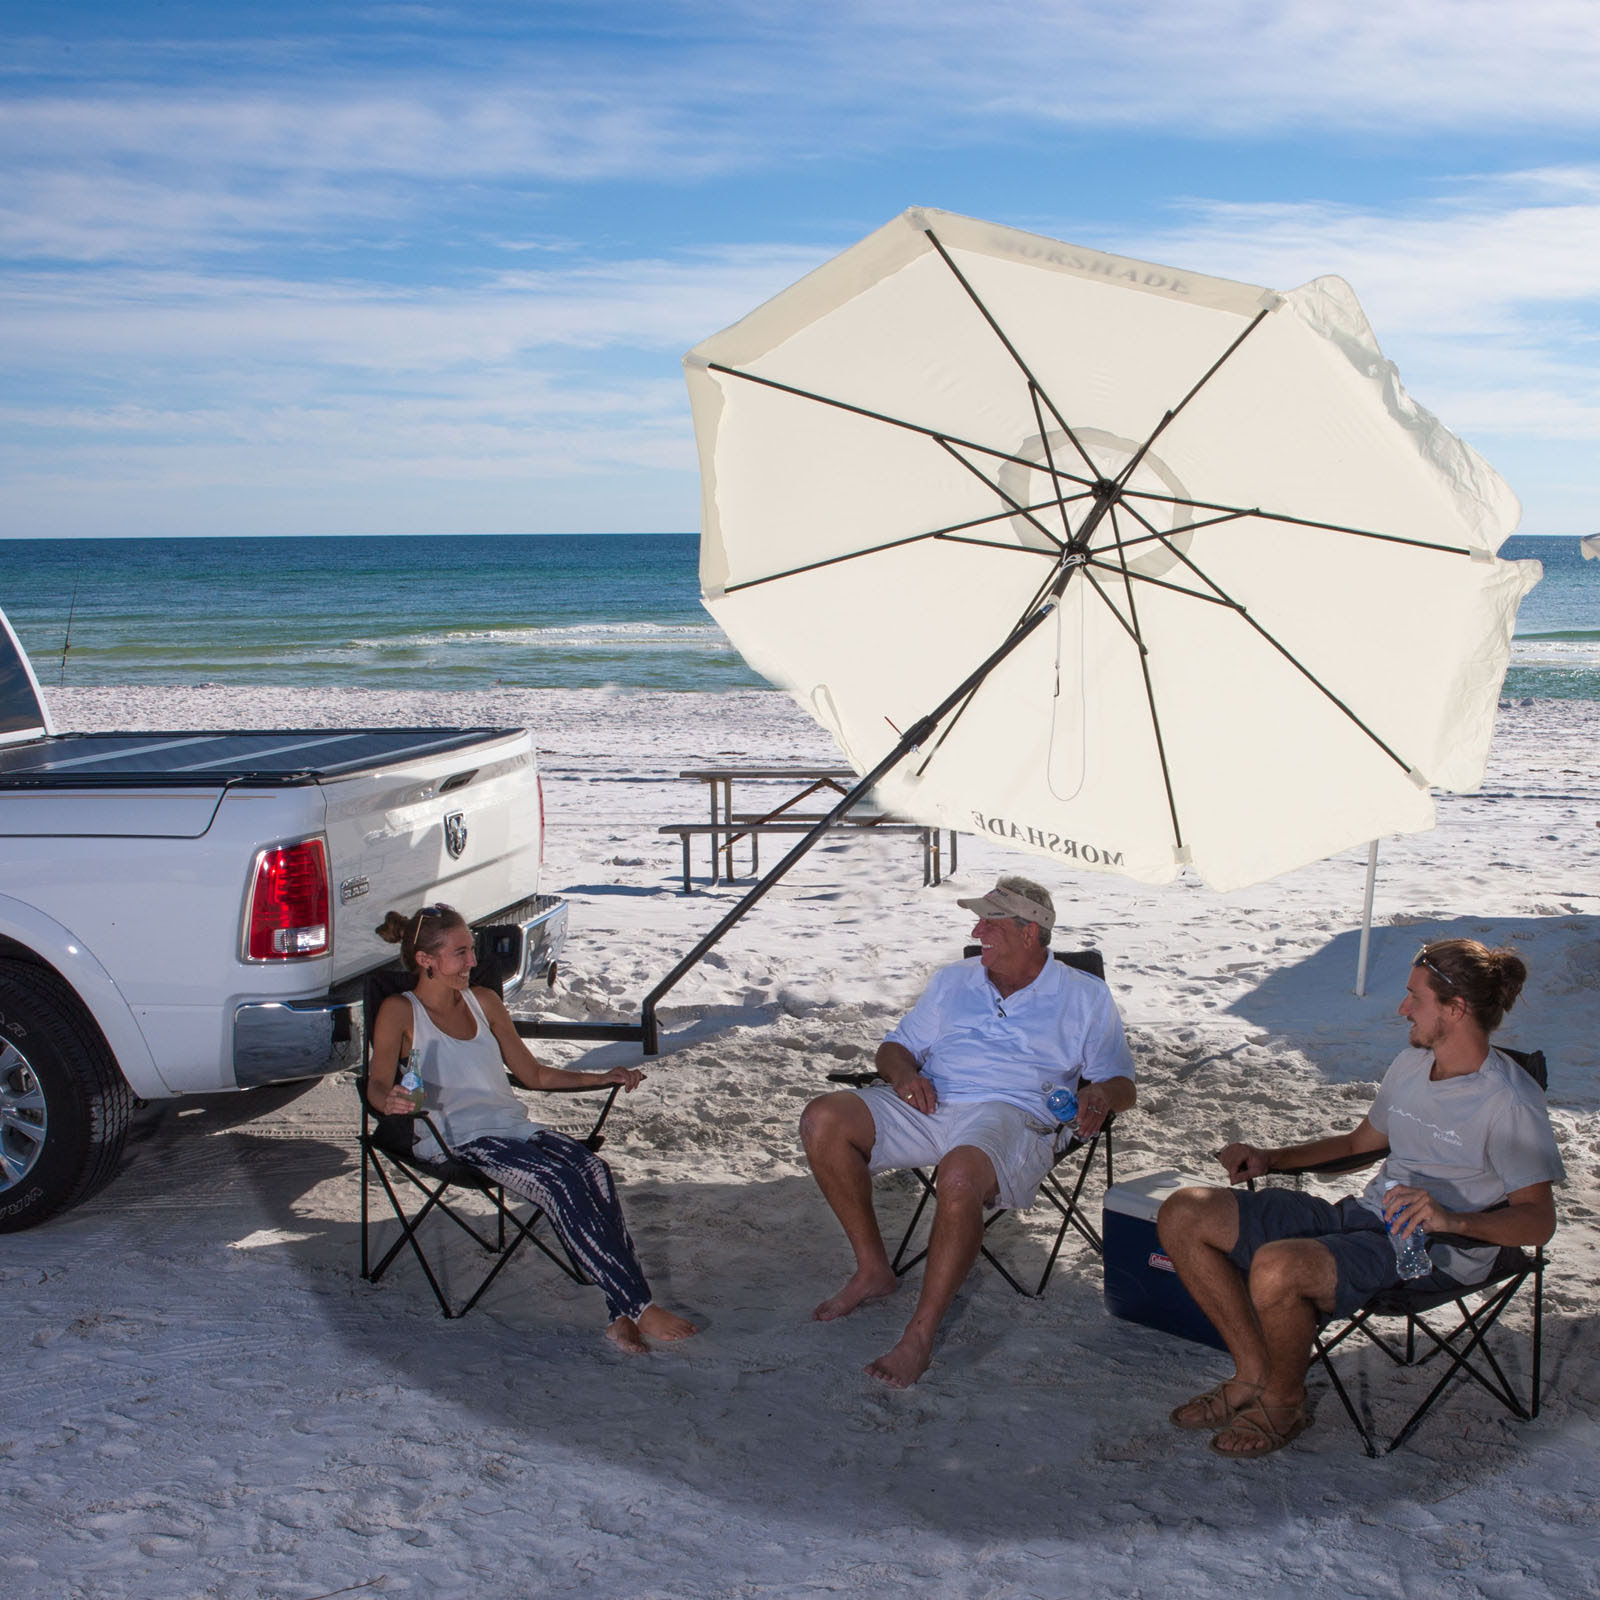 Morshade 9 ft. 360 Patio & Portable Shade Umbrella with ...